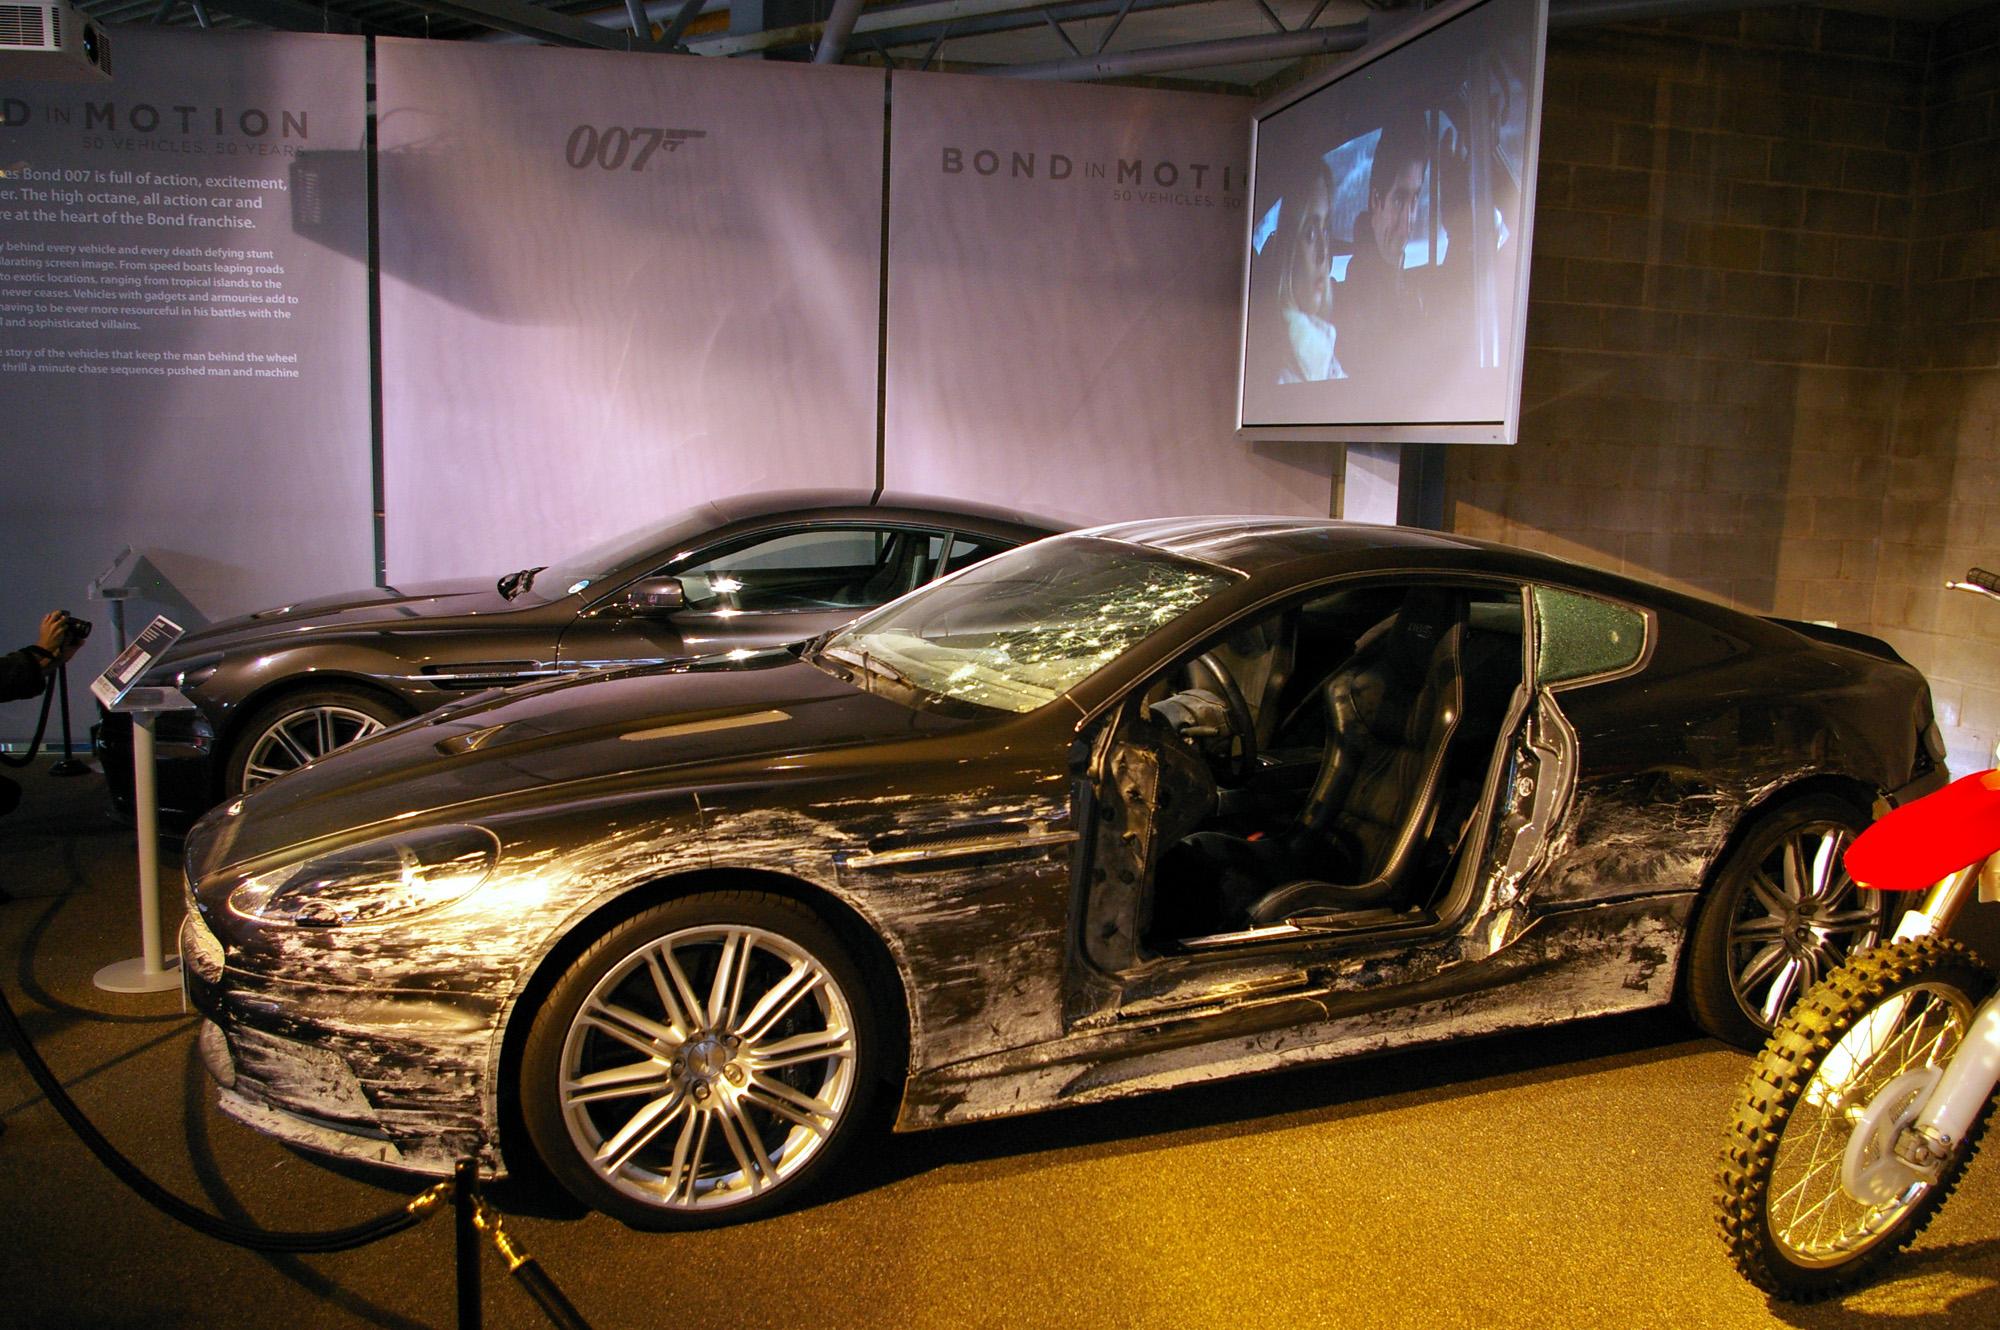 Aston Martin D85 used in Skyfall